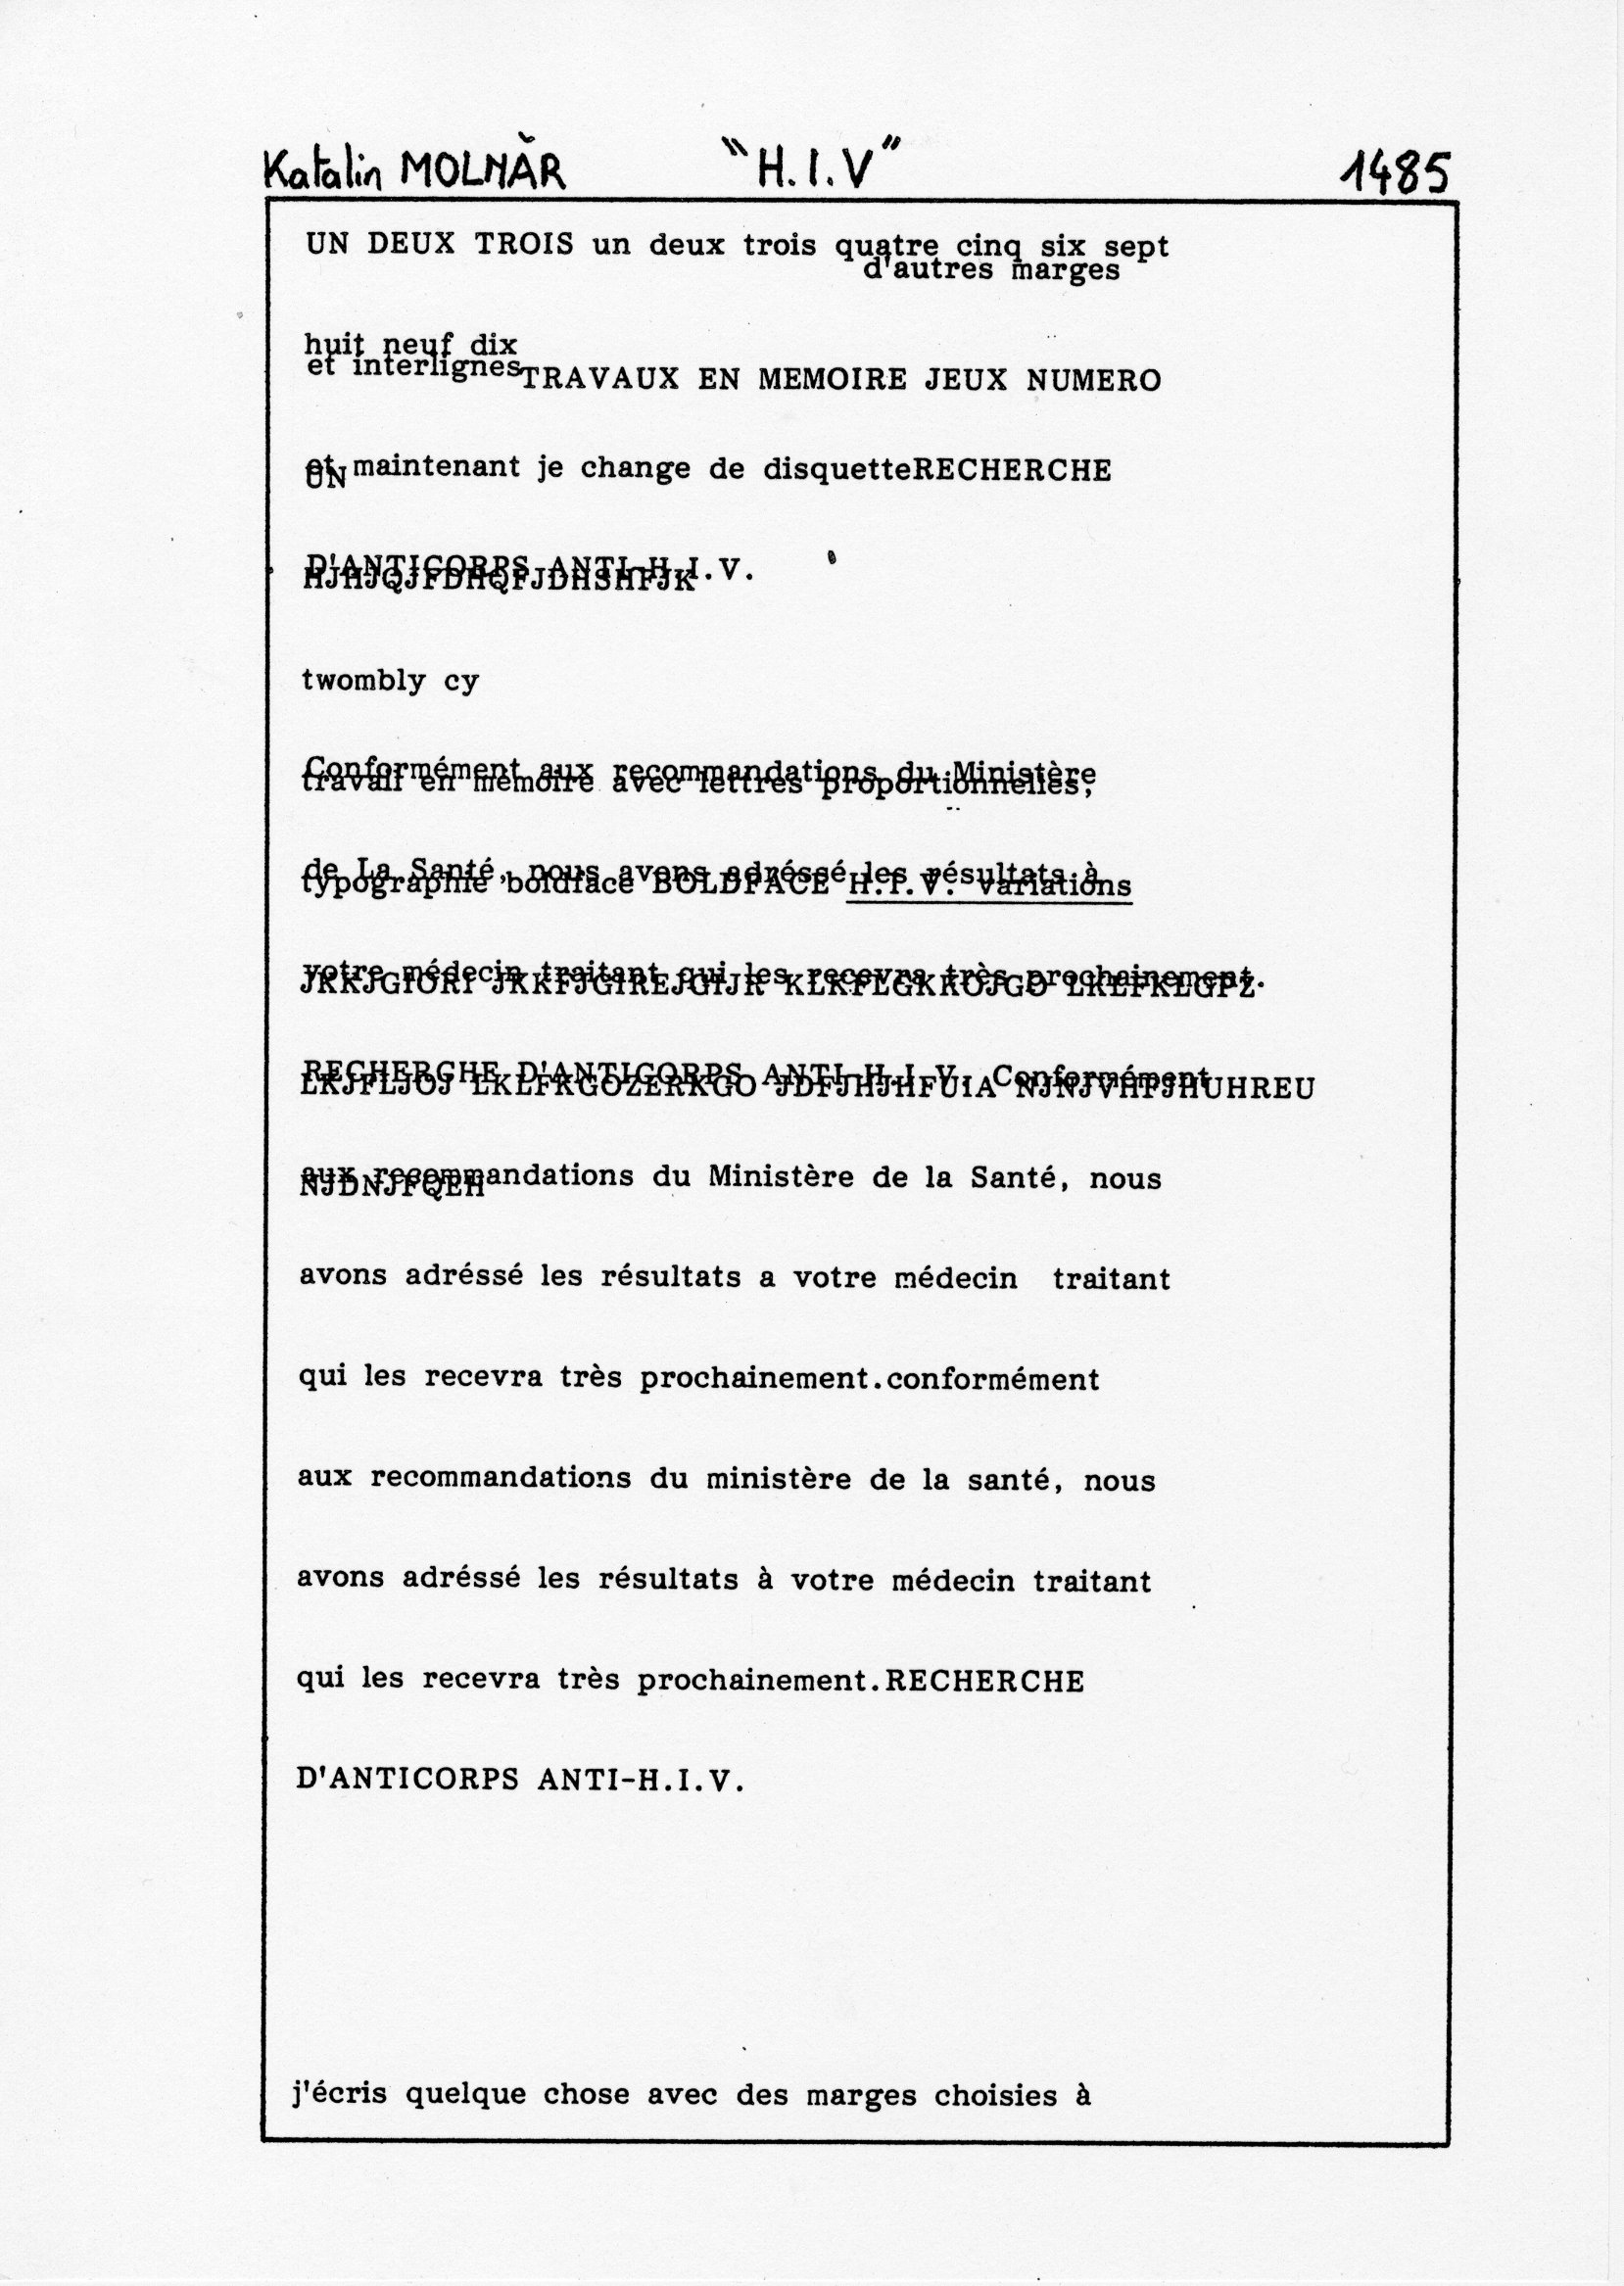 page 1485 K. Molnar H.I.V.